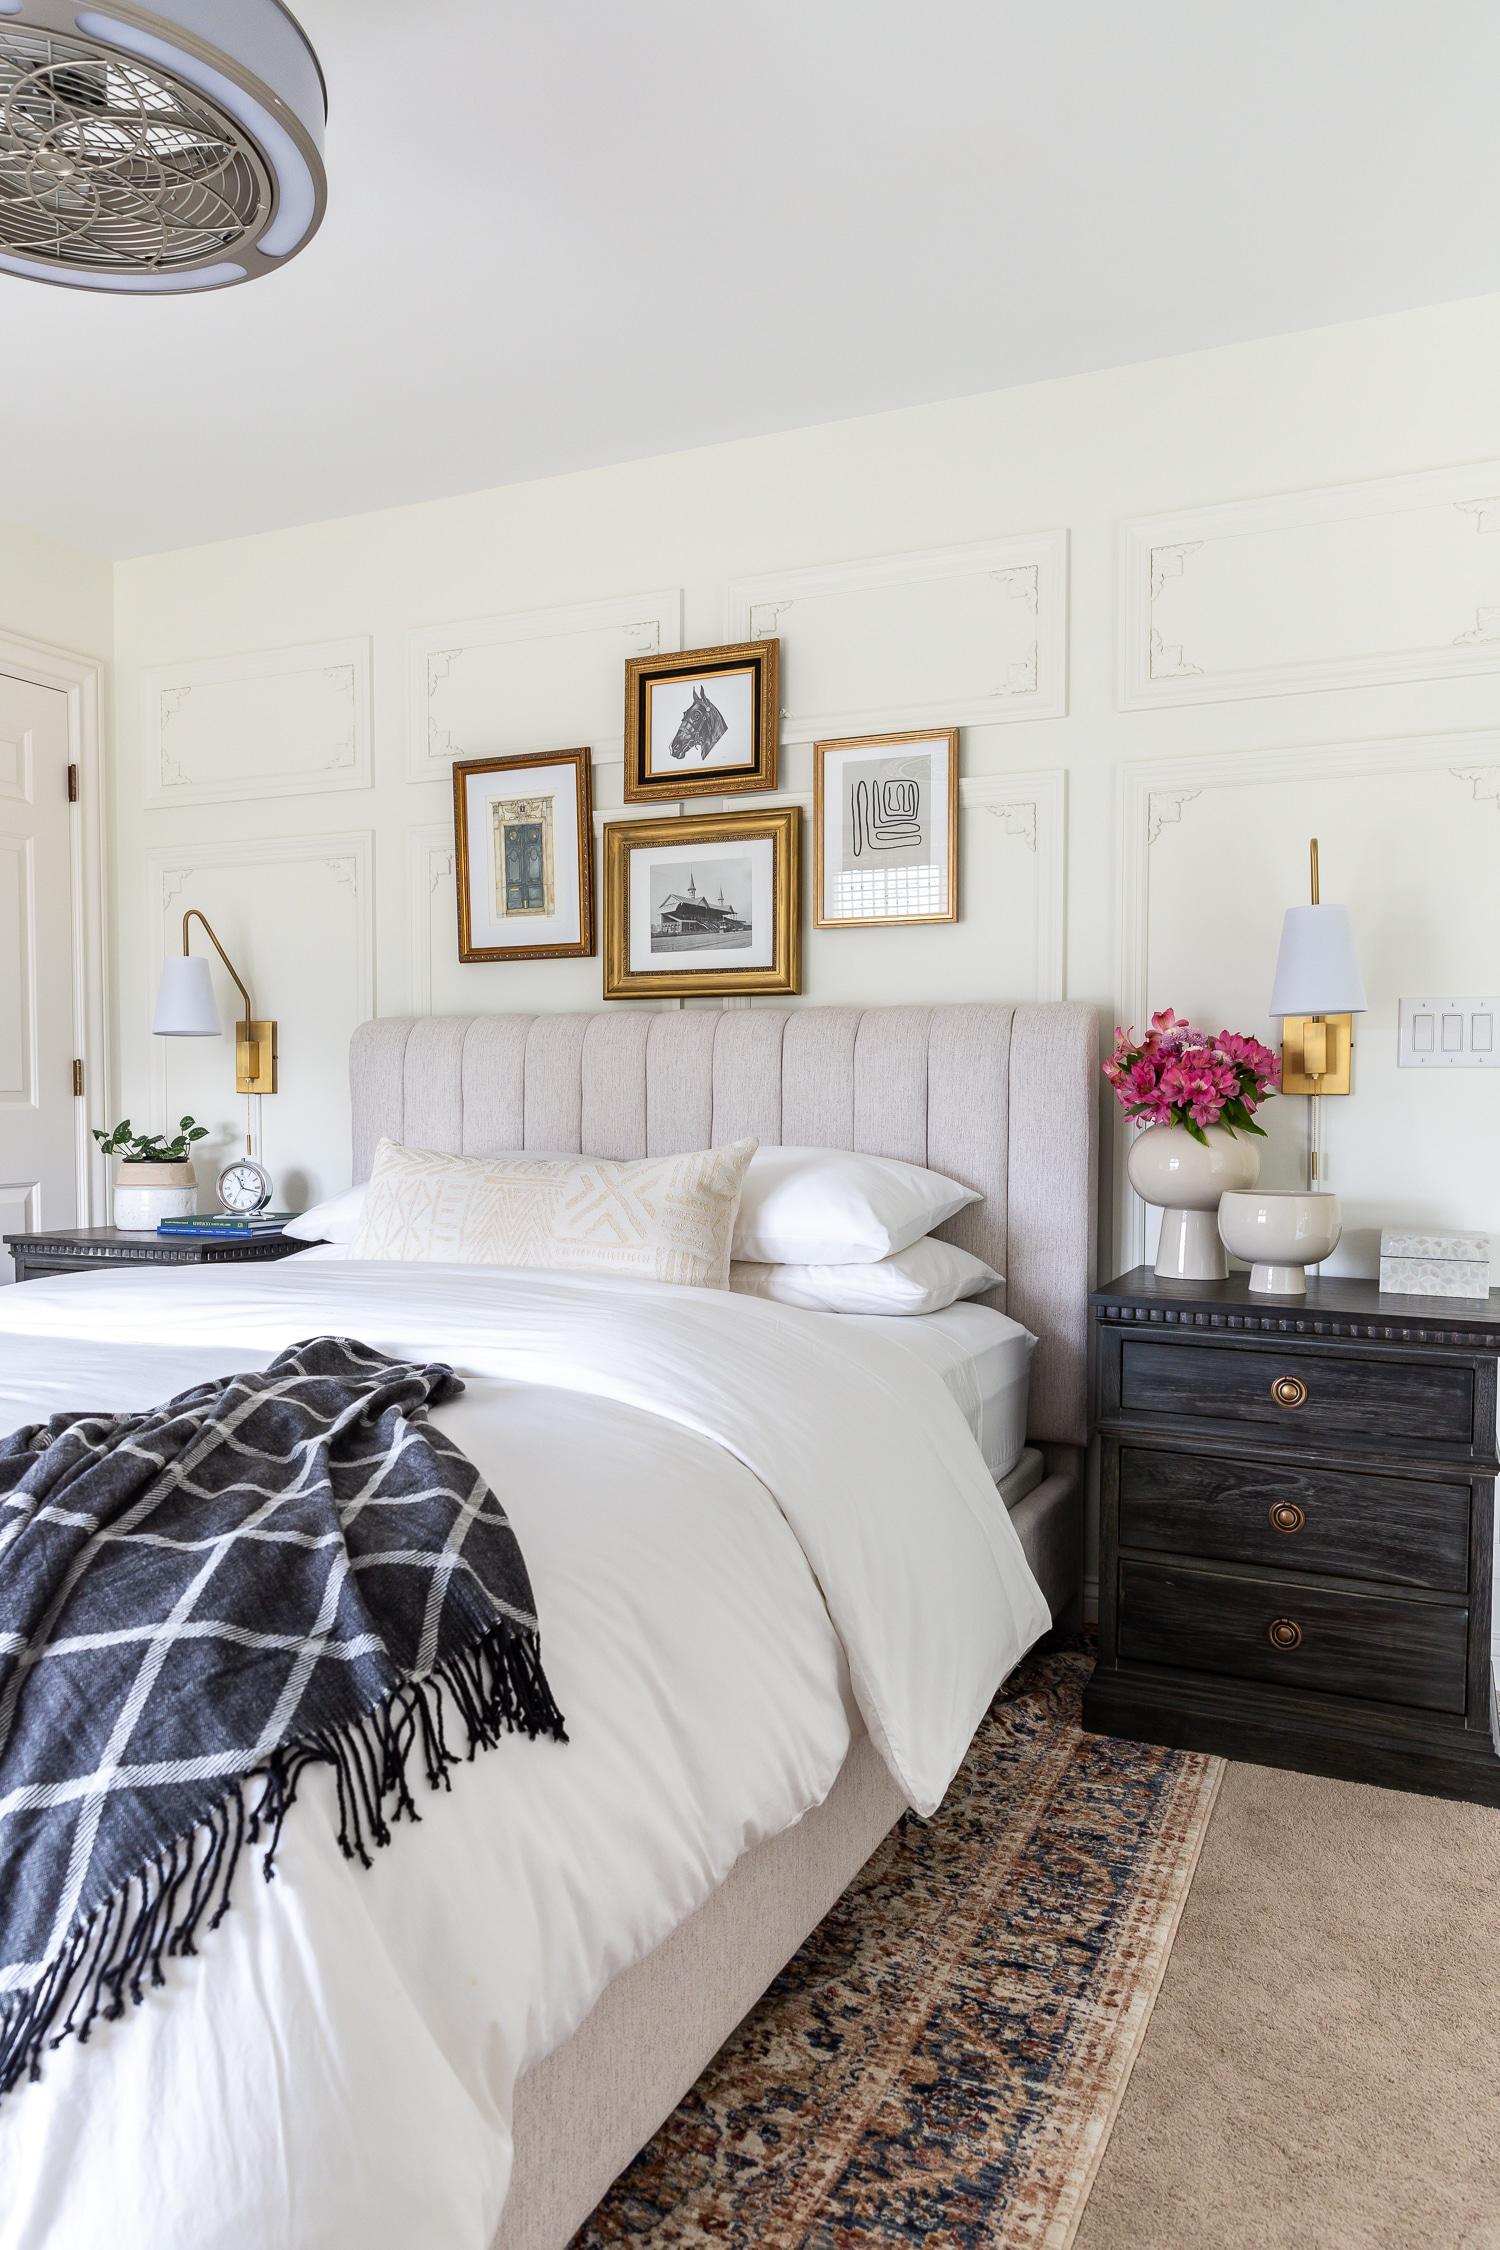 Amazing guest bedroom transformation